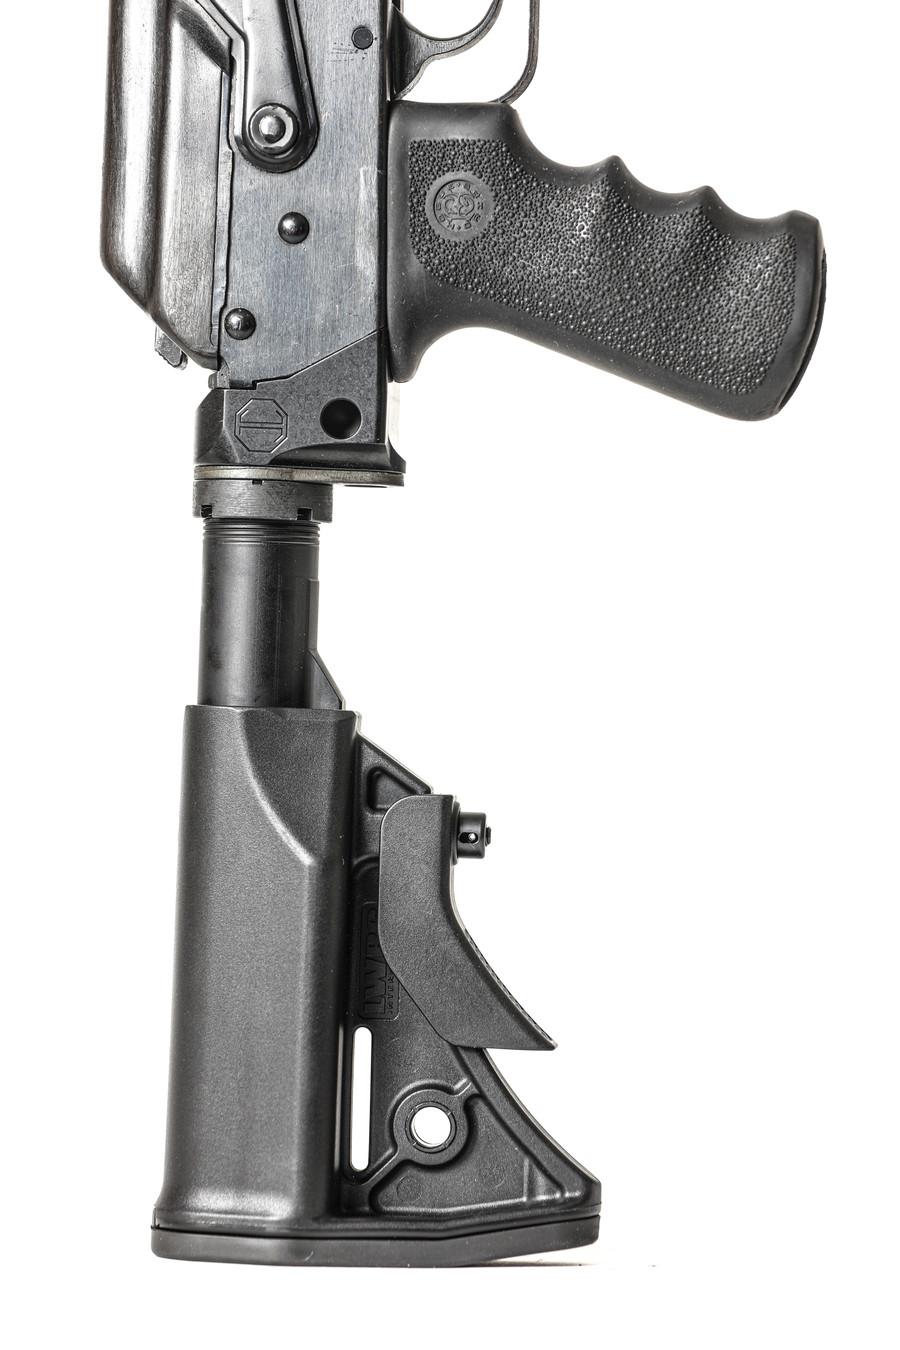 M4-MAK-S Slant Cut Stamped Receiver - BLEM